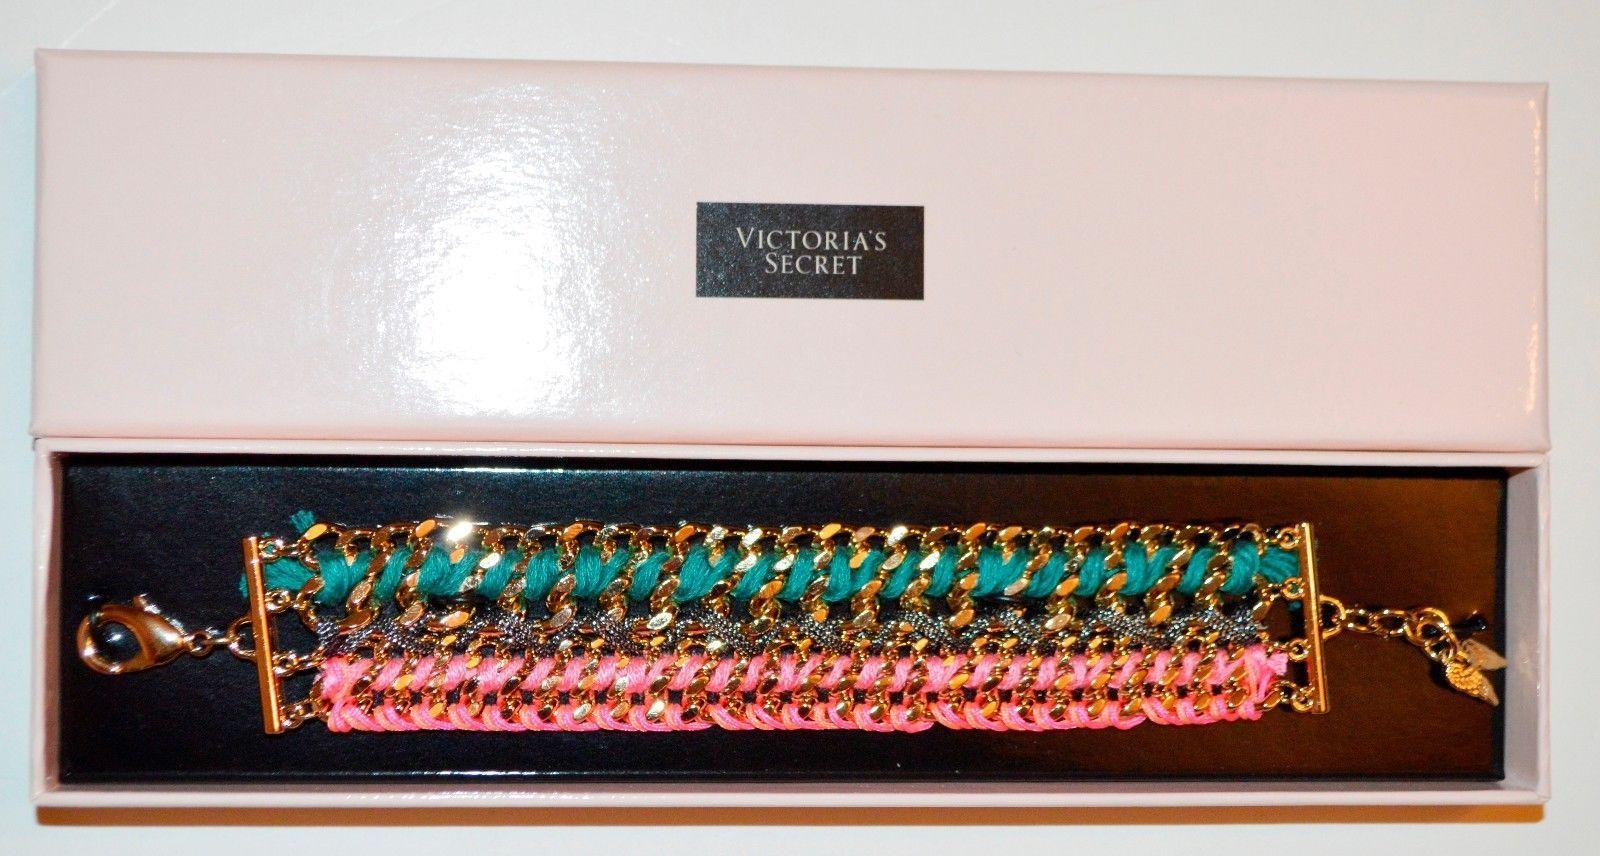 NEW Victoria's Secret 10k Real Flash Gold Bracelet in Teal & Pink. Retail $78